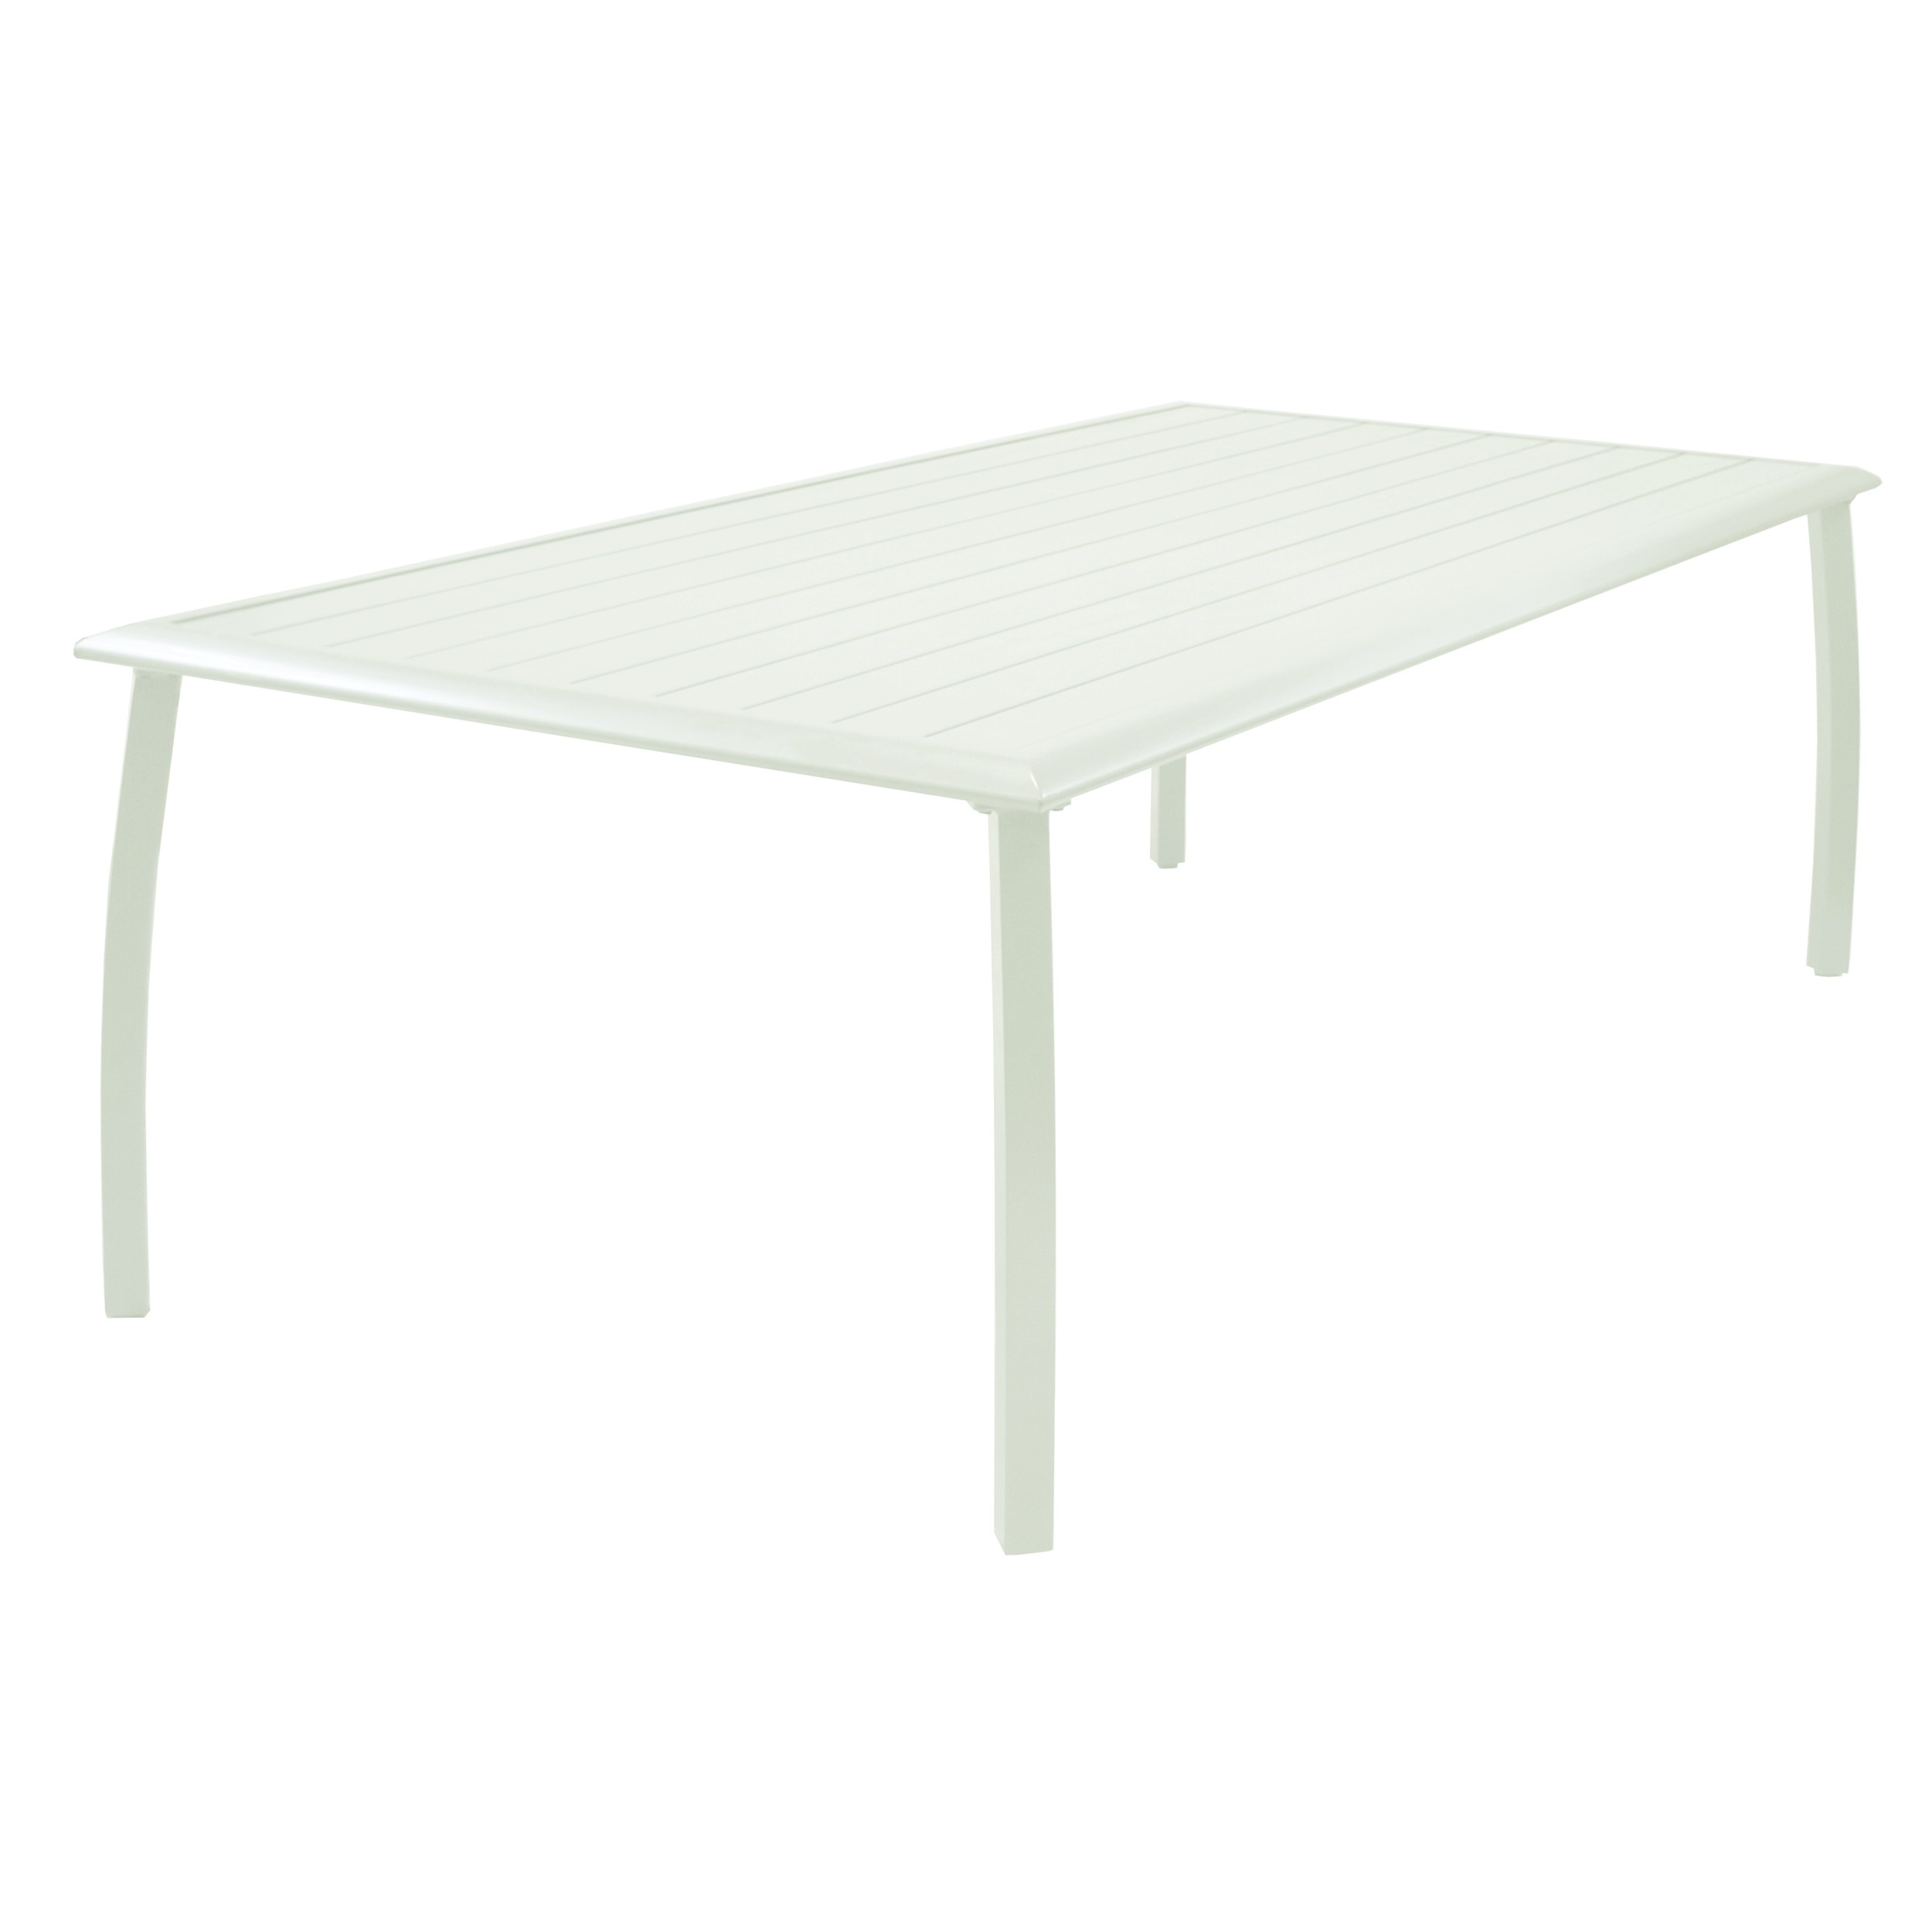 Table de jardin 180cm Livourne blanche